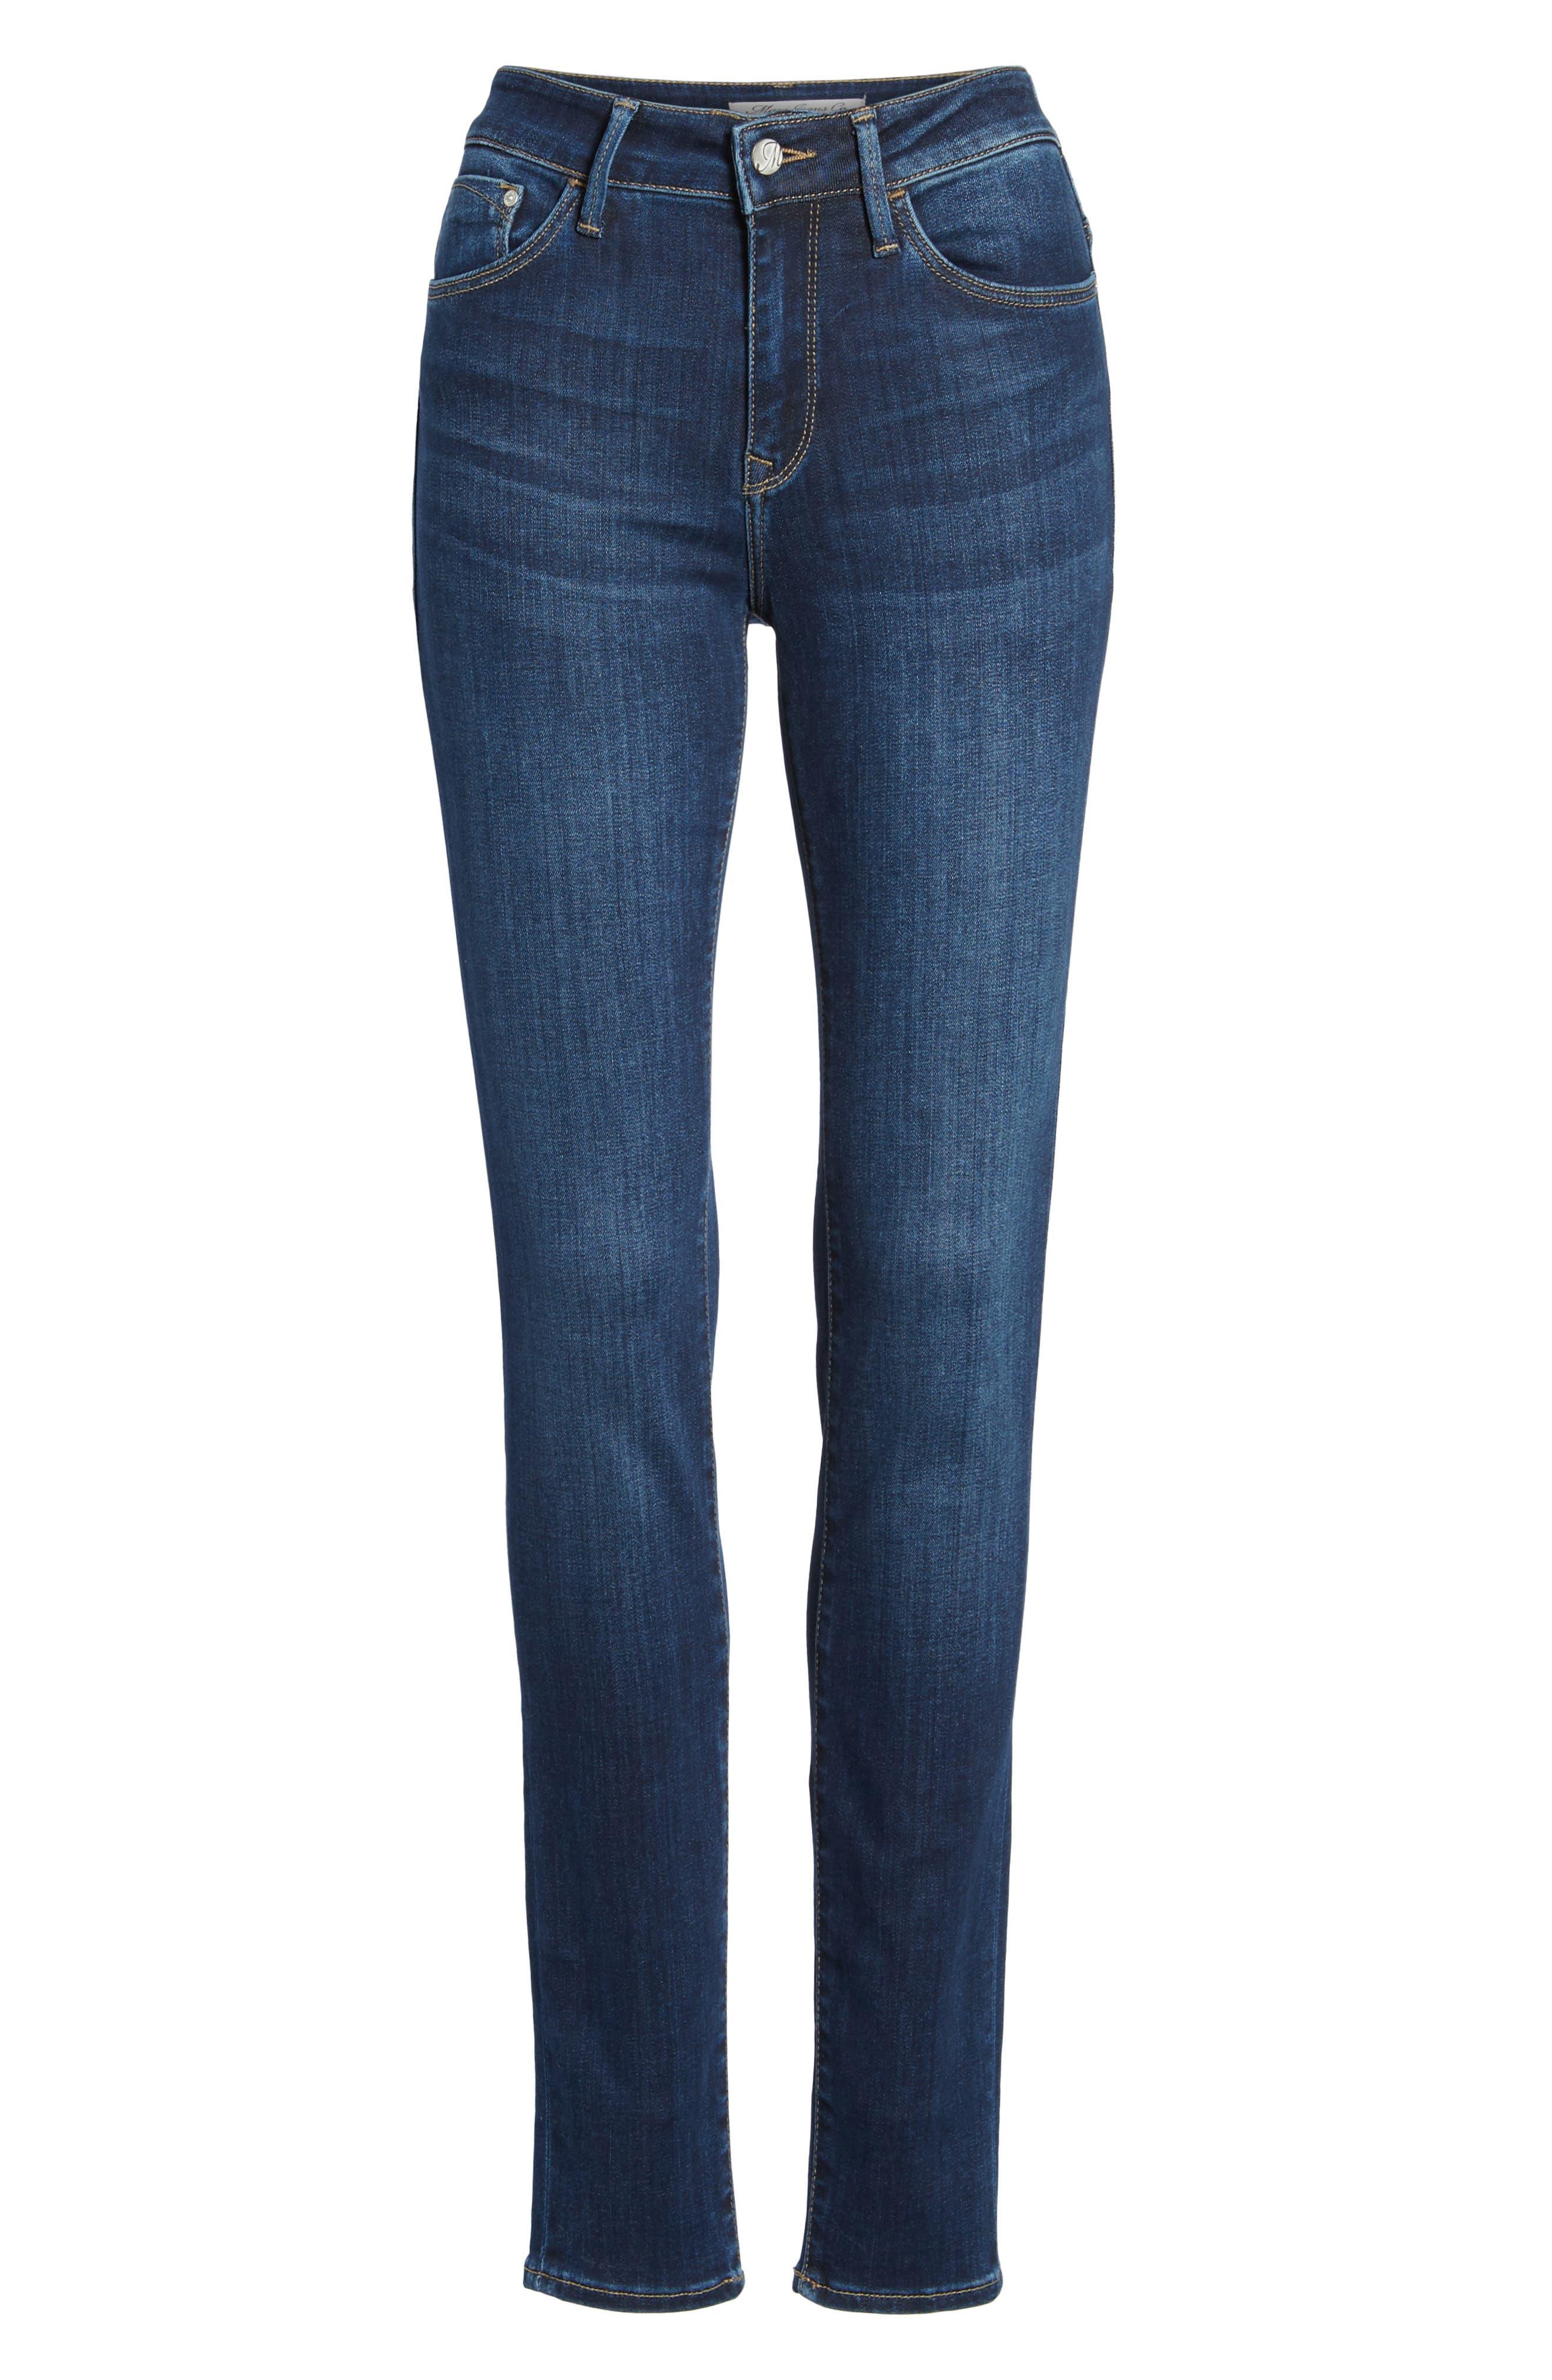 Alissa Skinny Jeans,                             Alternate thumbnail 7, color,                             400